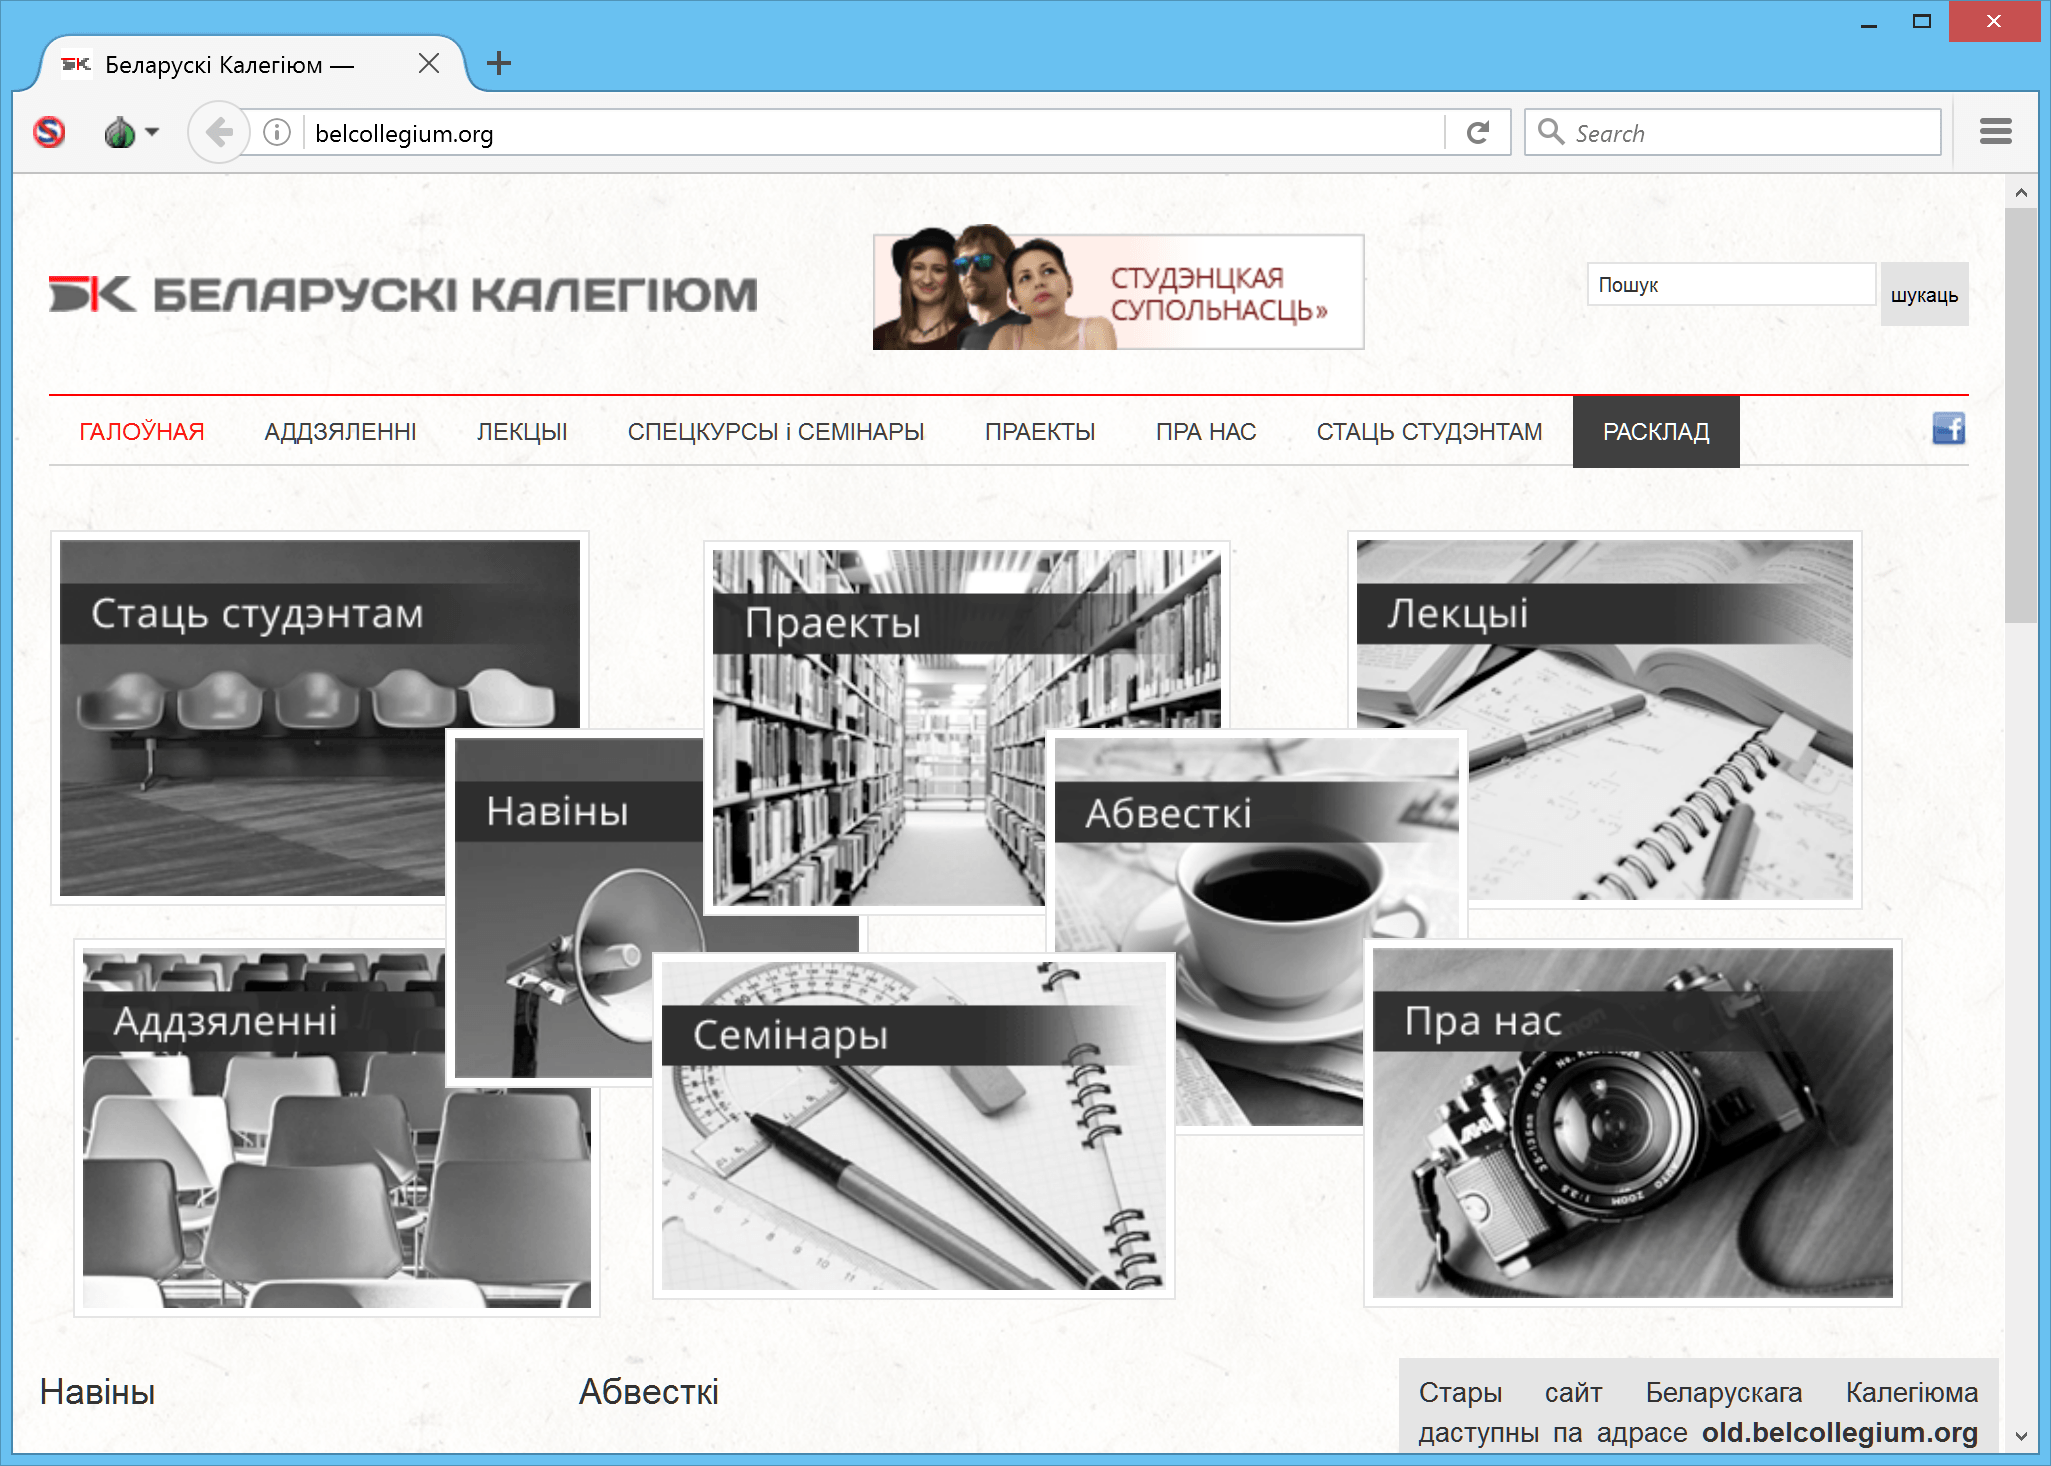 KopiLuwak: A New JavaScript Payload from Turla   Securelist